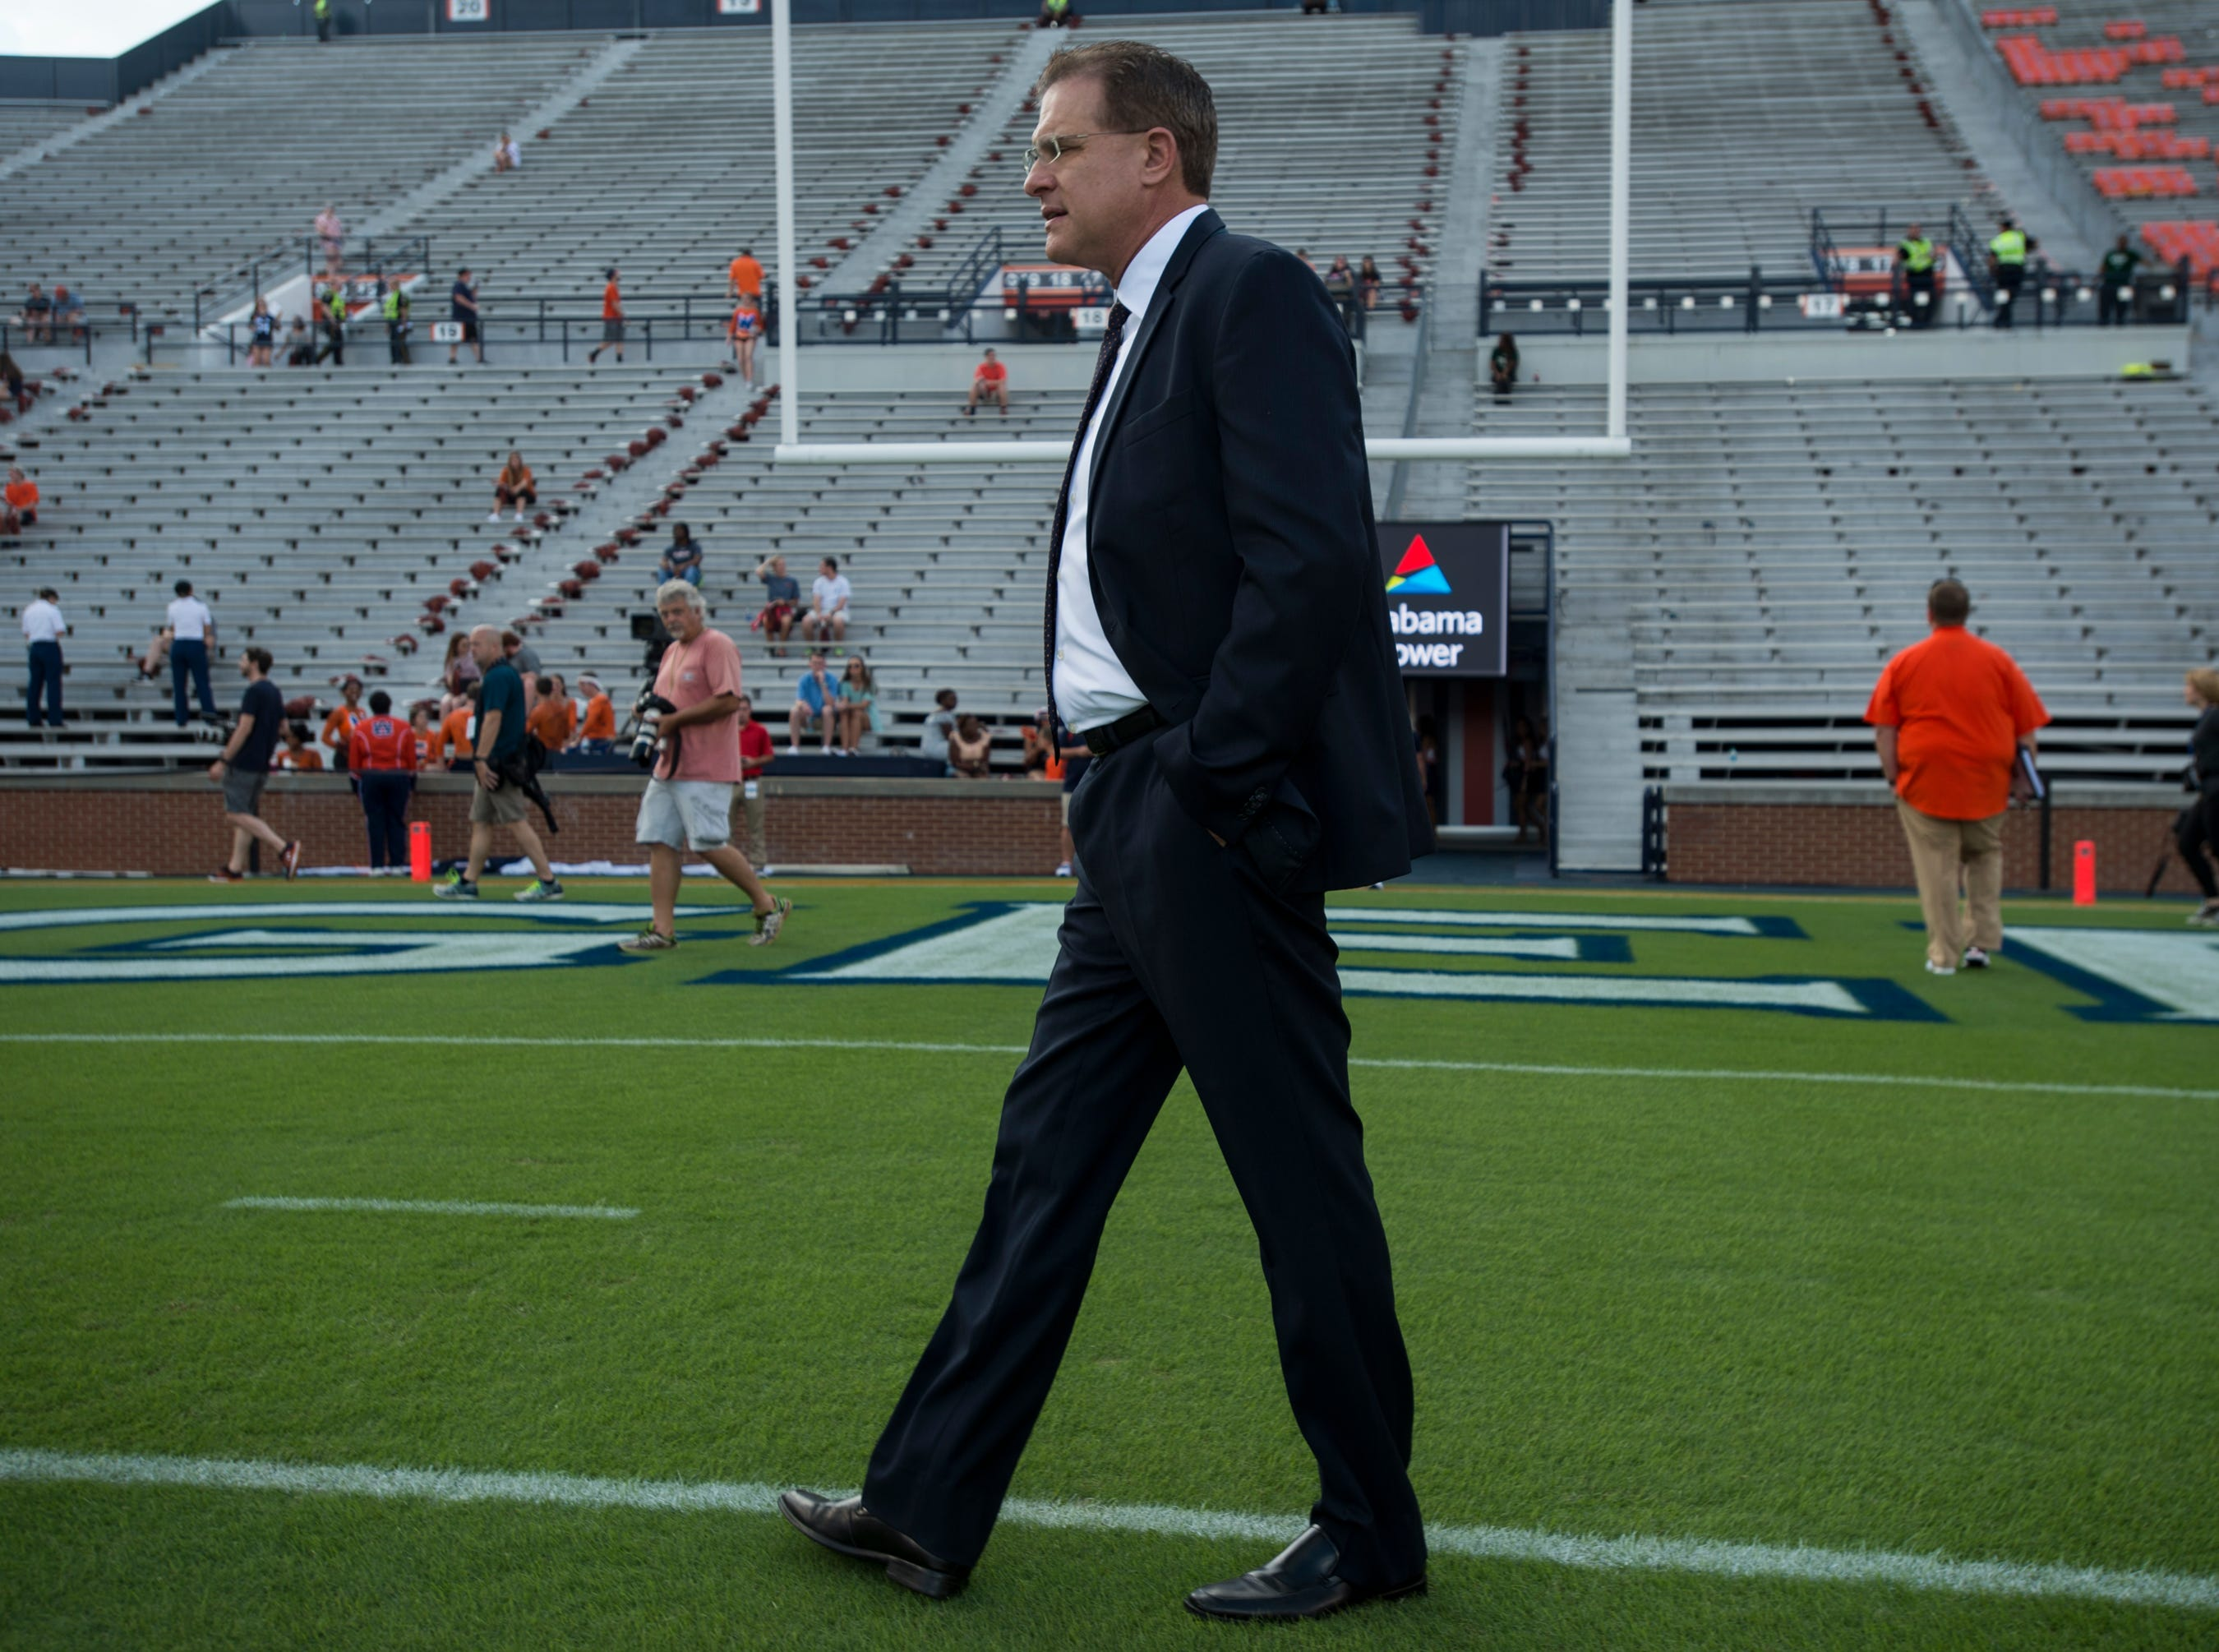 Auburn head coach Gus Malzahn walks on to the field with his team following the Tiger Walk at Jordan-Hare Stadium in Auburn, Ala., on Saturday, Sept. 29, 2018.